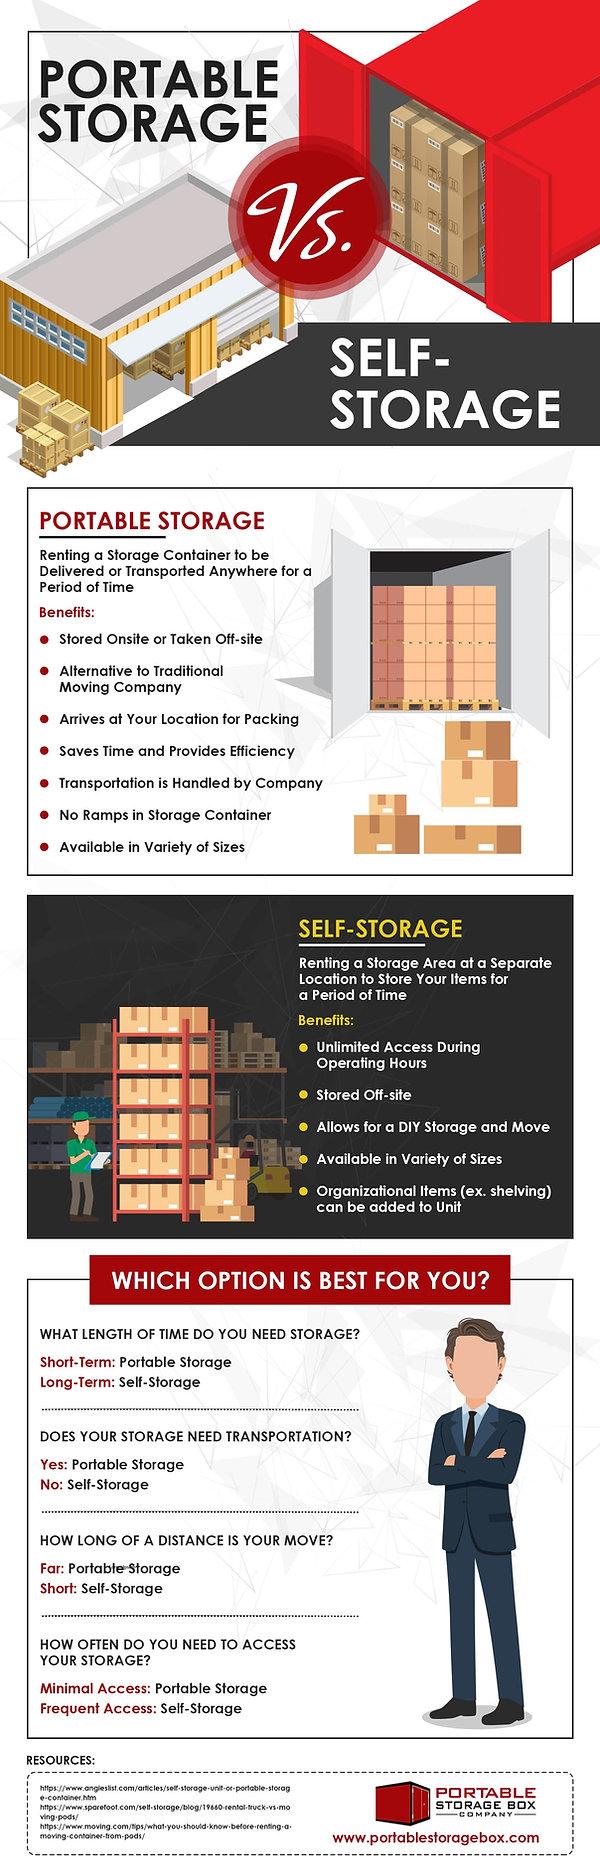 Portable Storage vs. Self-Storage_V2.jpg